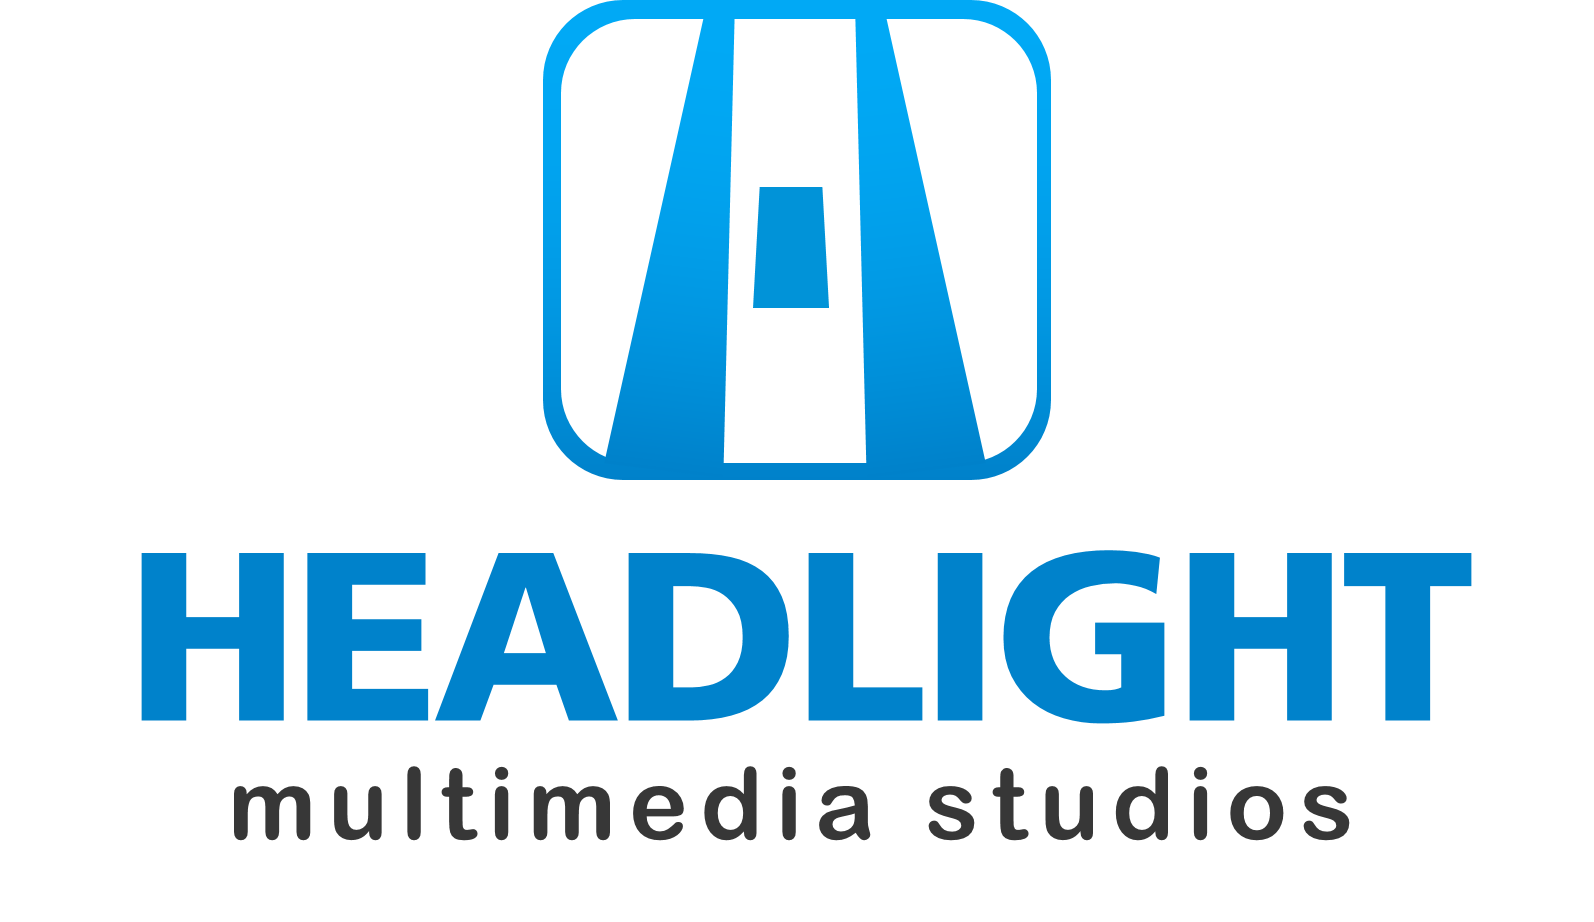 Headlight Studios